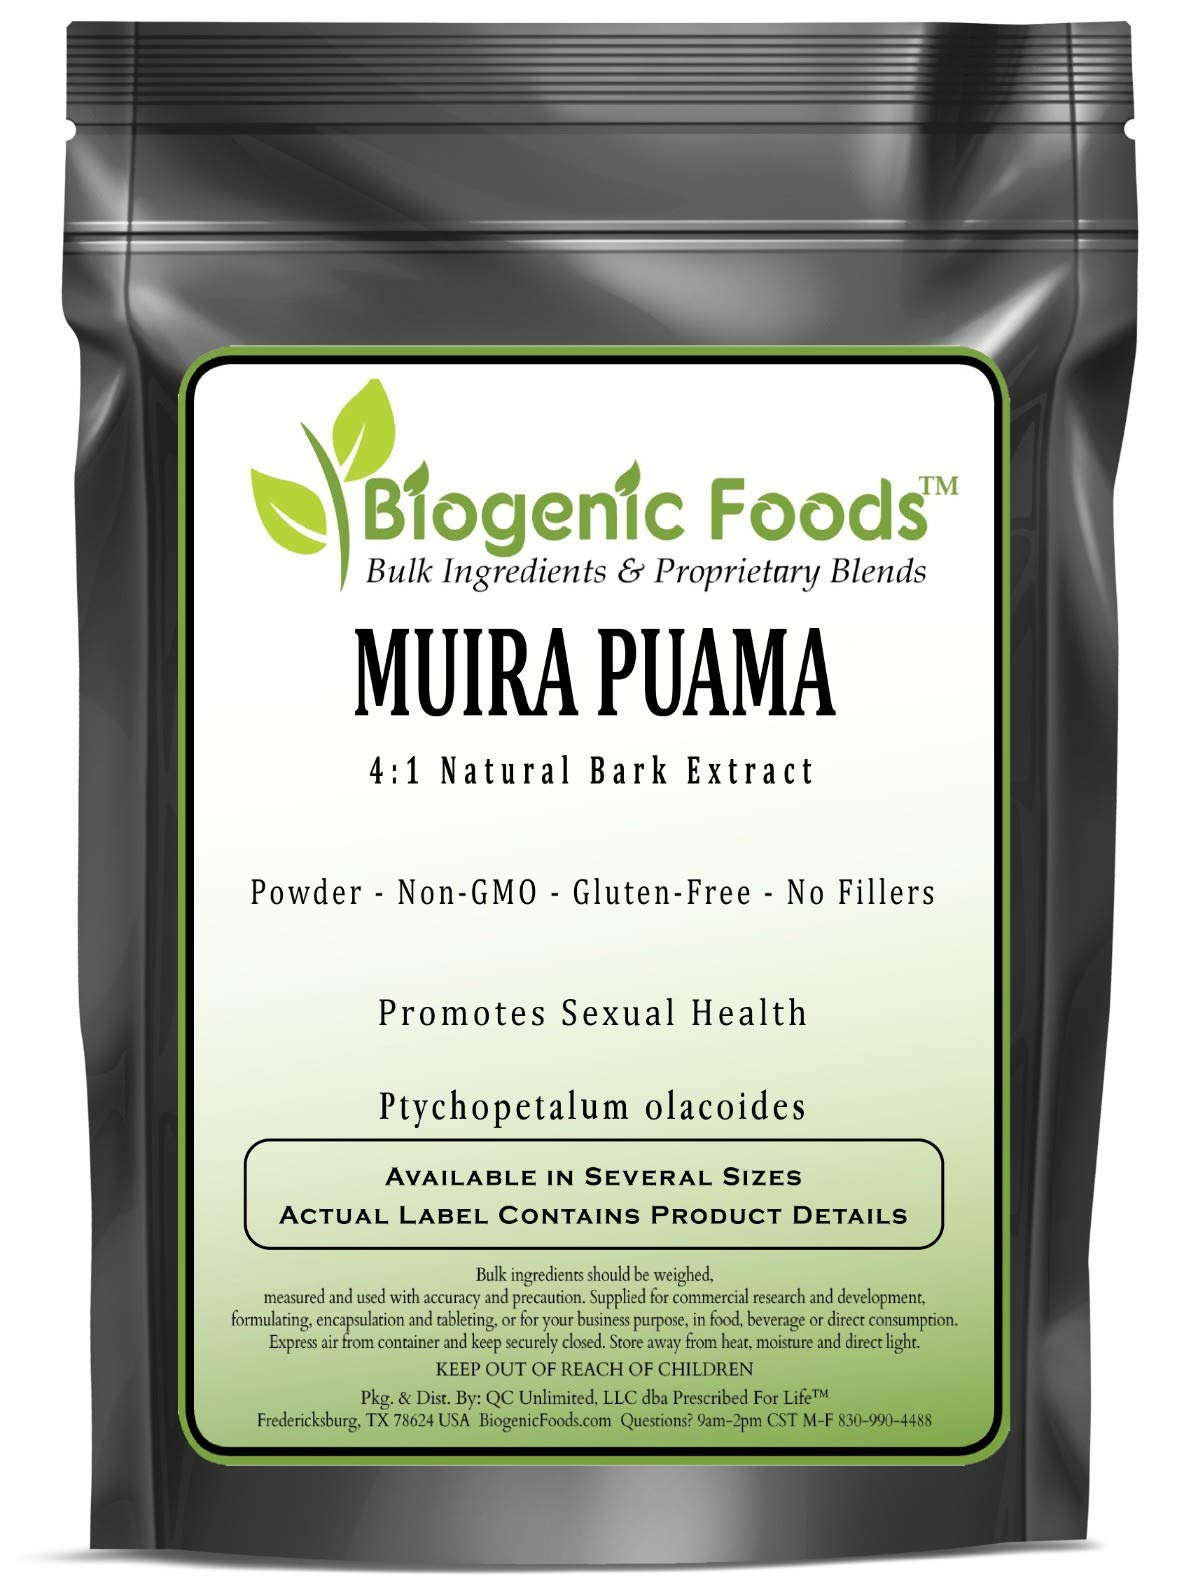 Muira Puama - 4:1 Natural Bark Powder Extract (Ptychopetalum olacoides), 5 kg